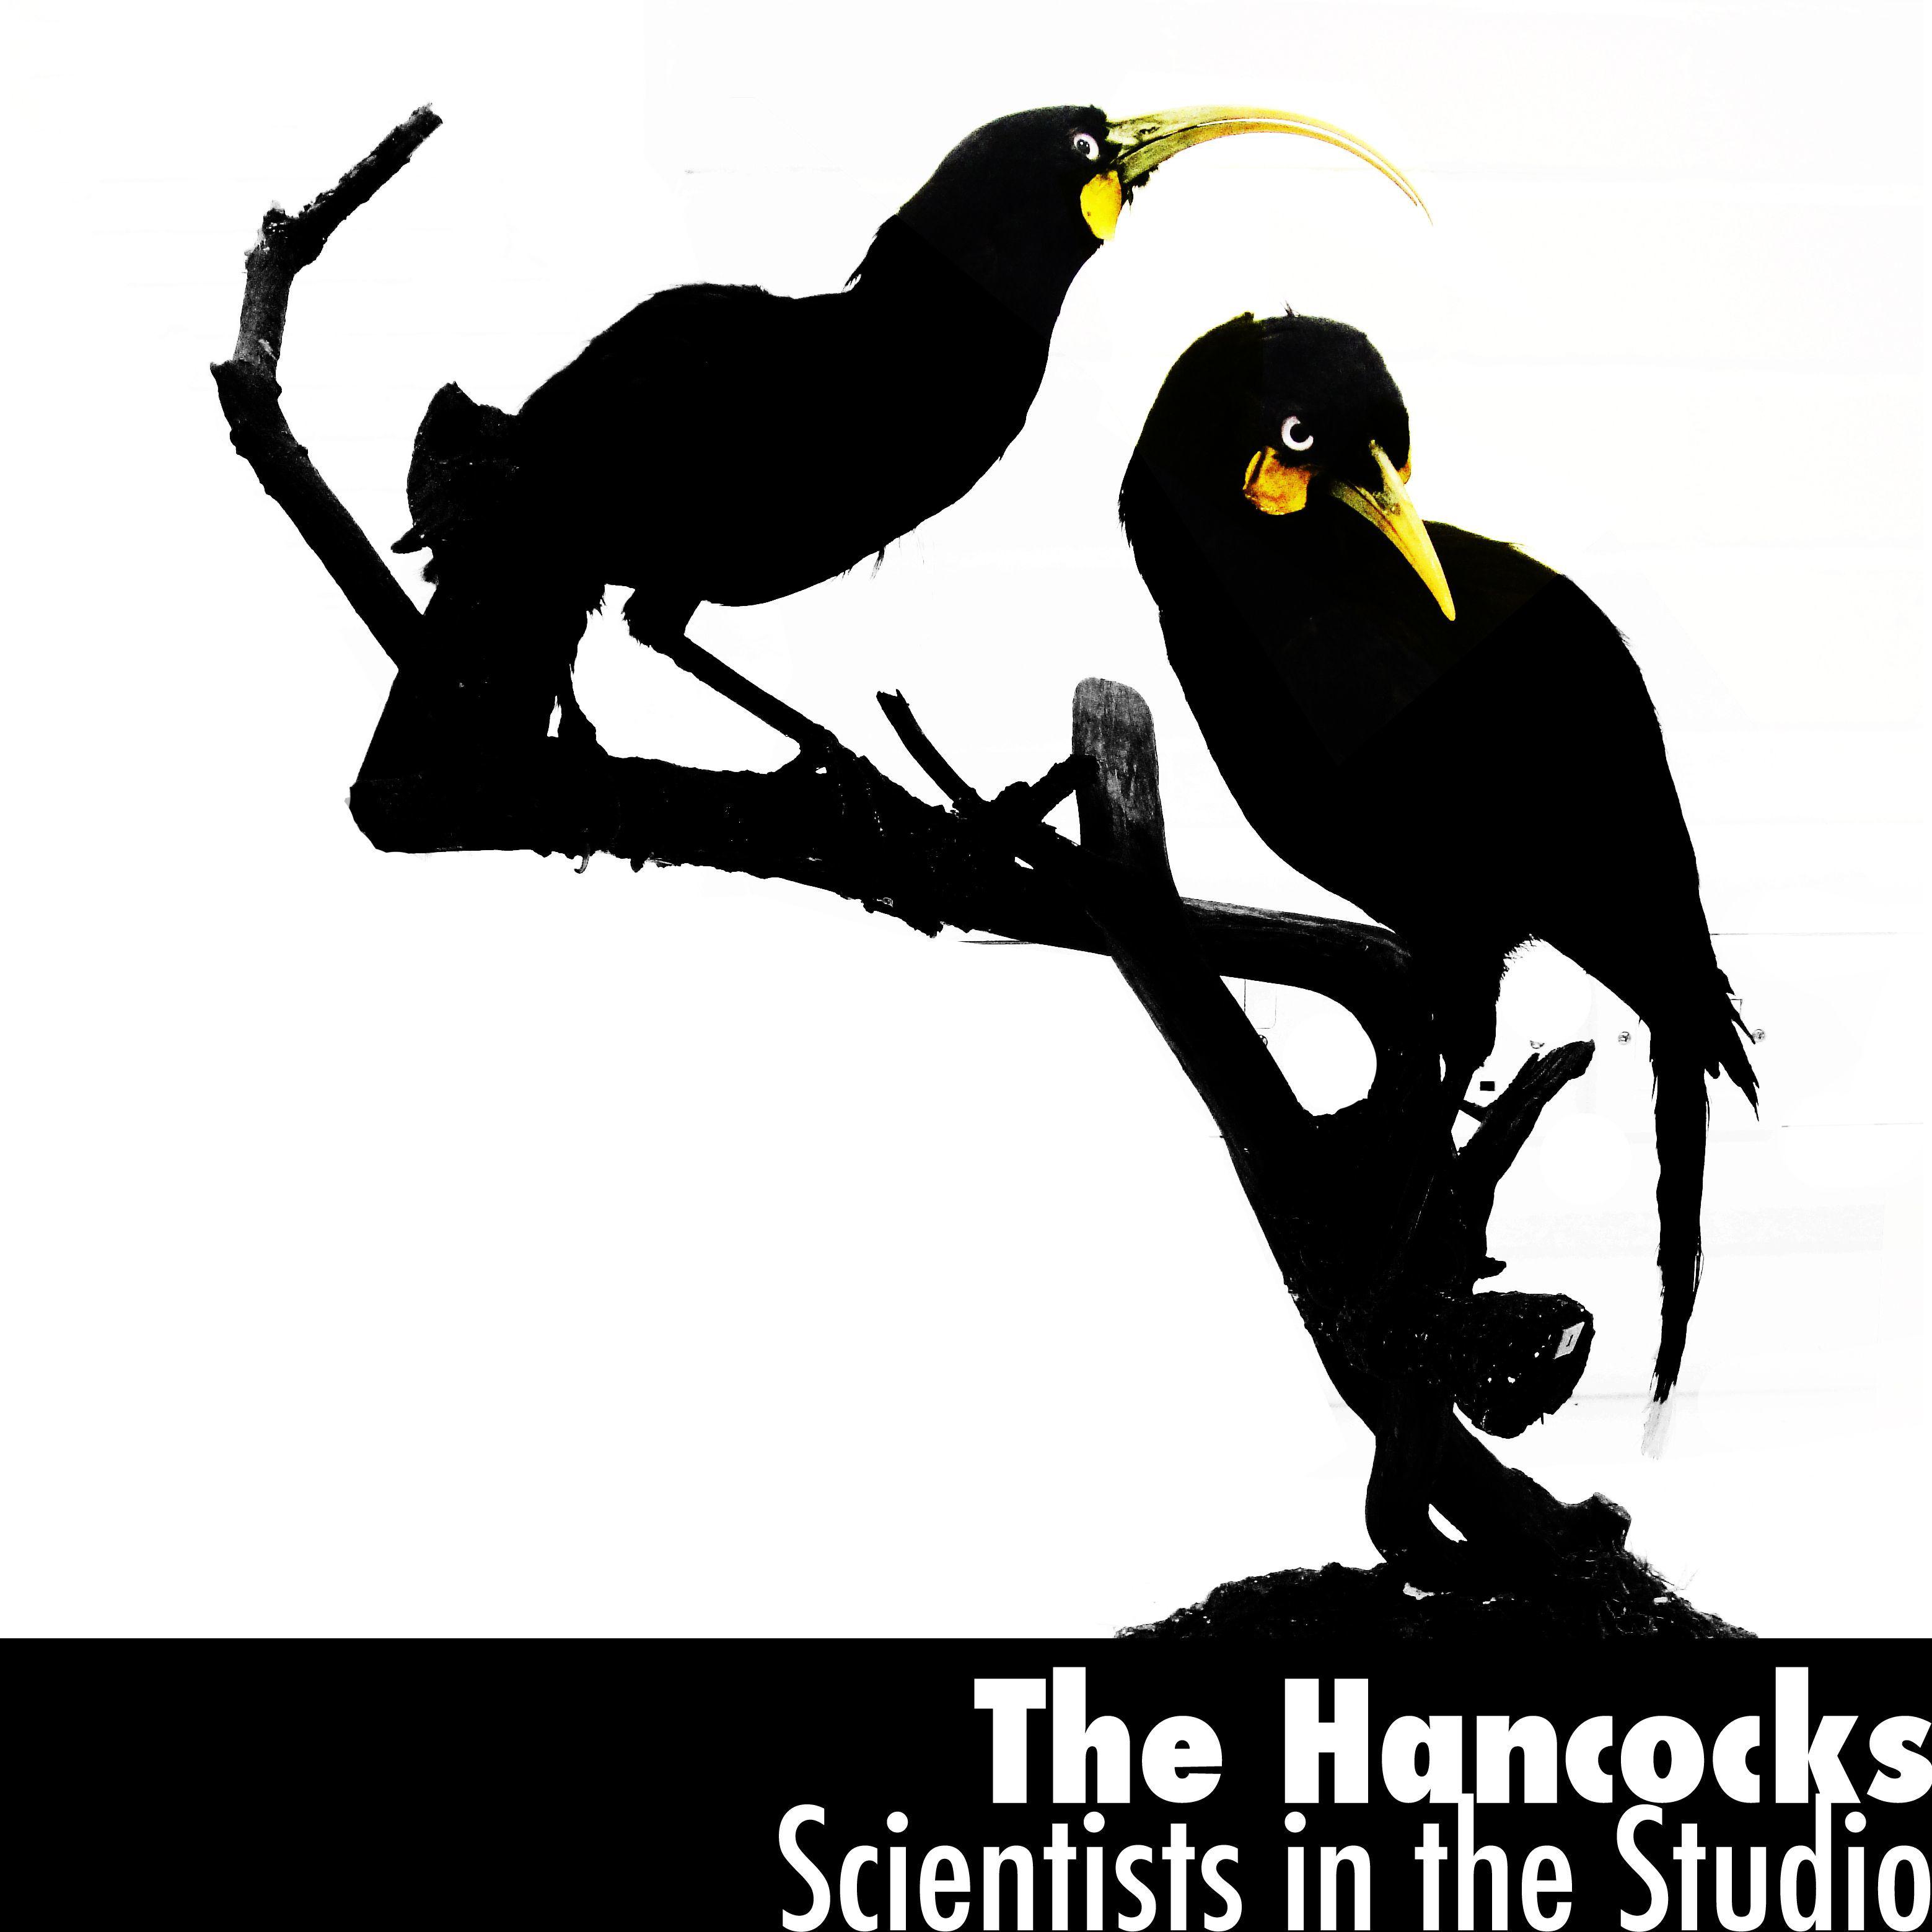 hancock bird logo